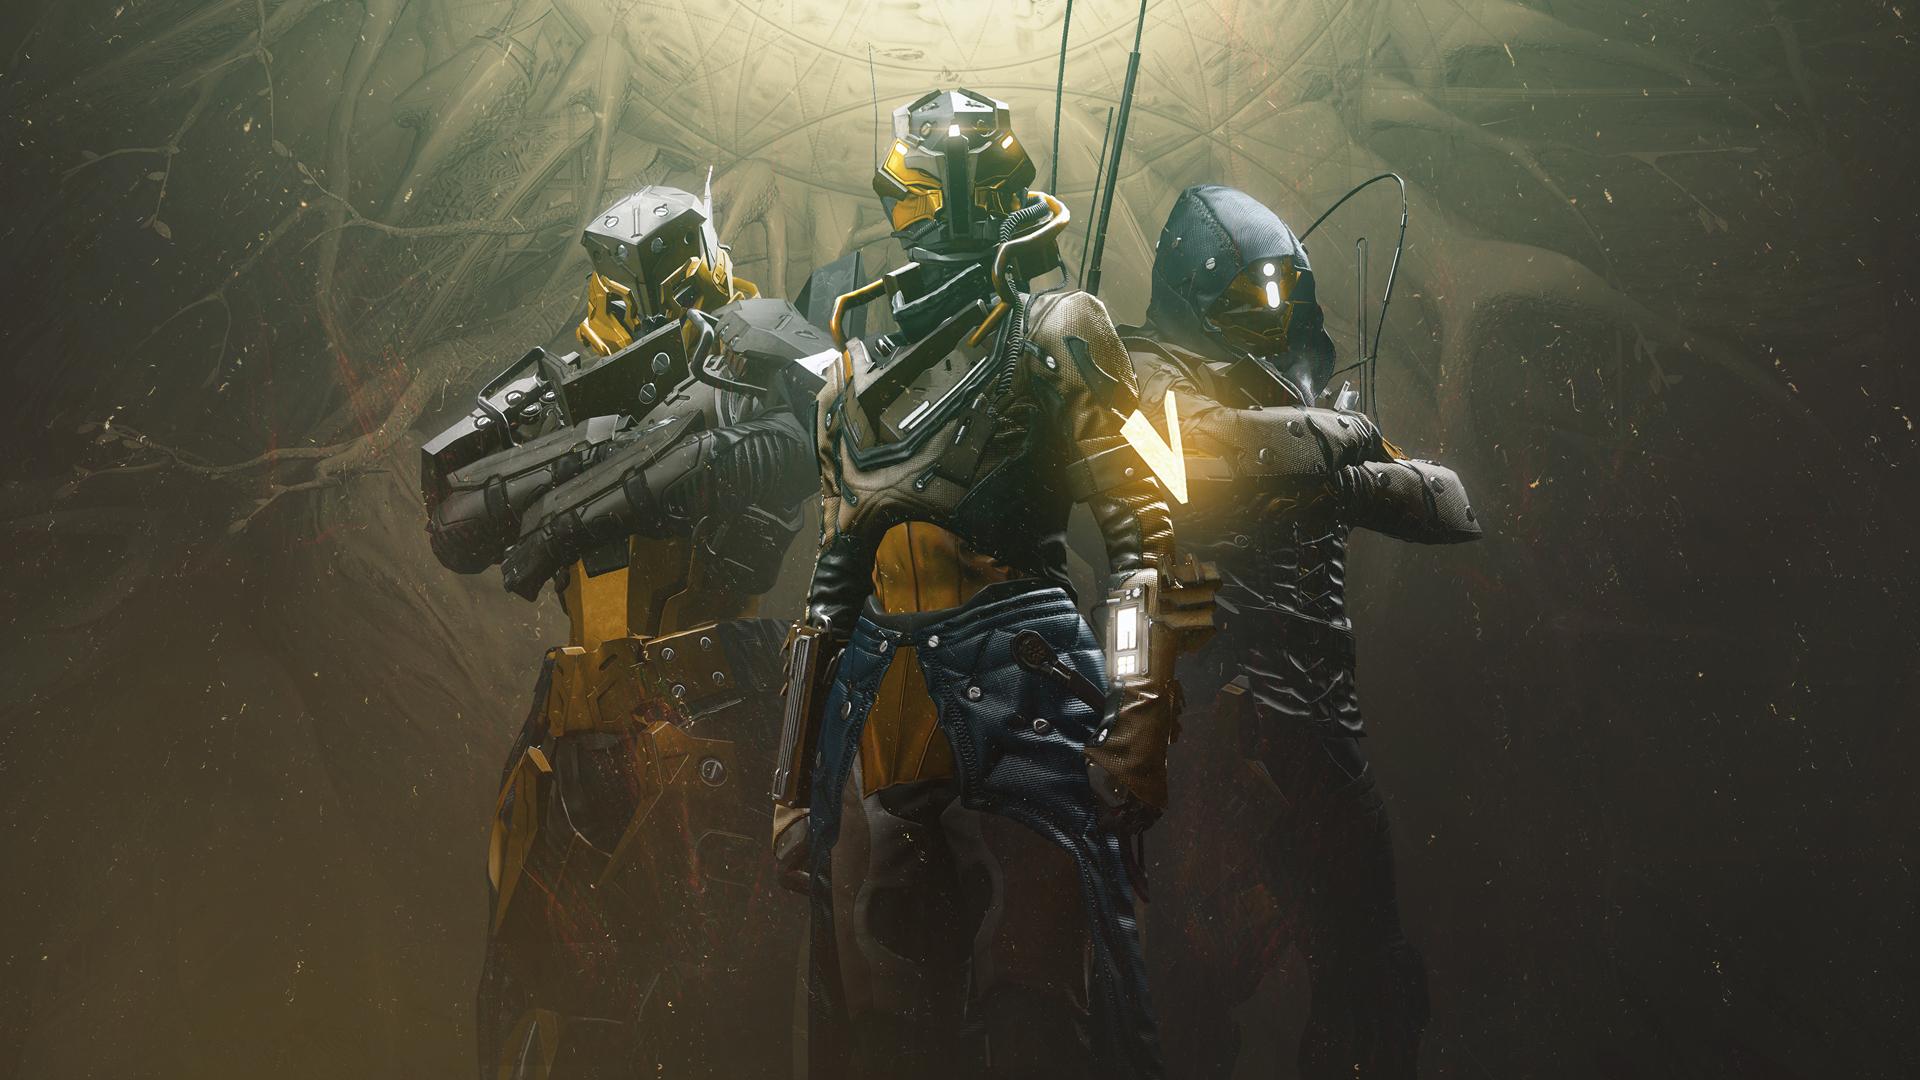 16+ High Resolution Destiny 2 Backgrounds Gif